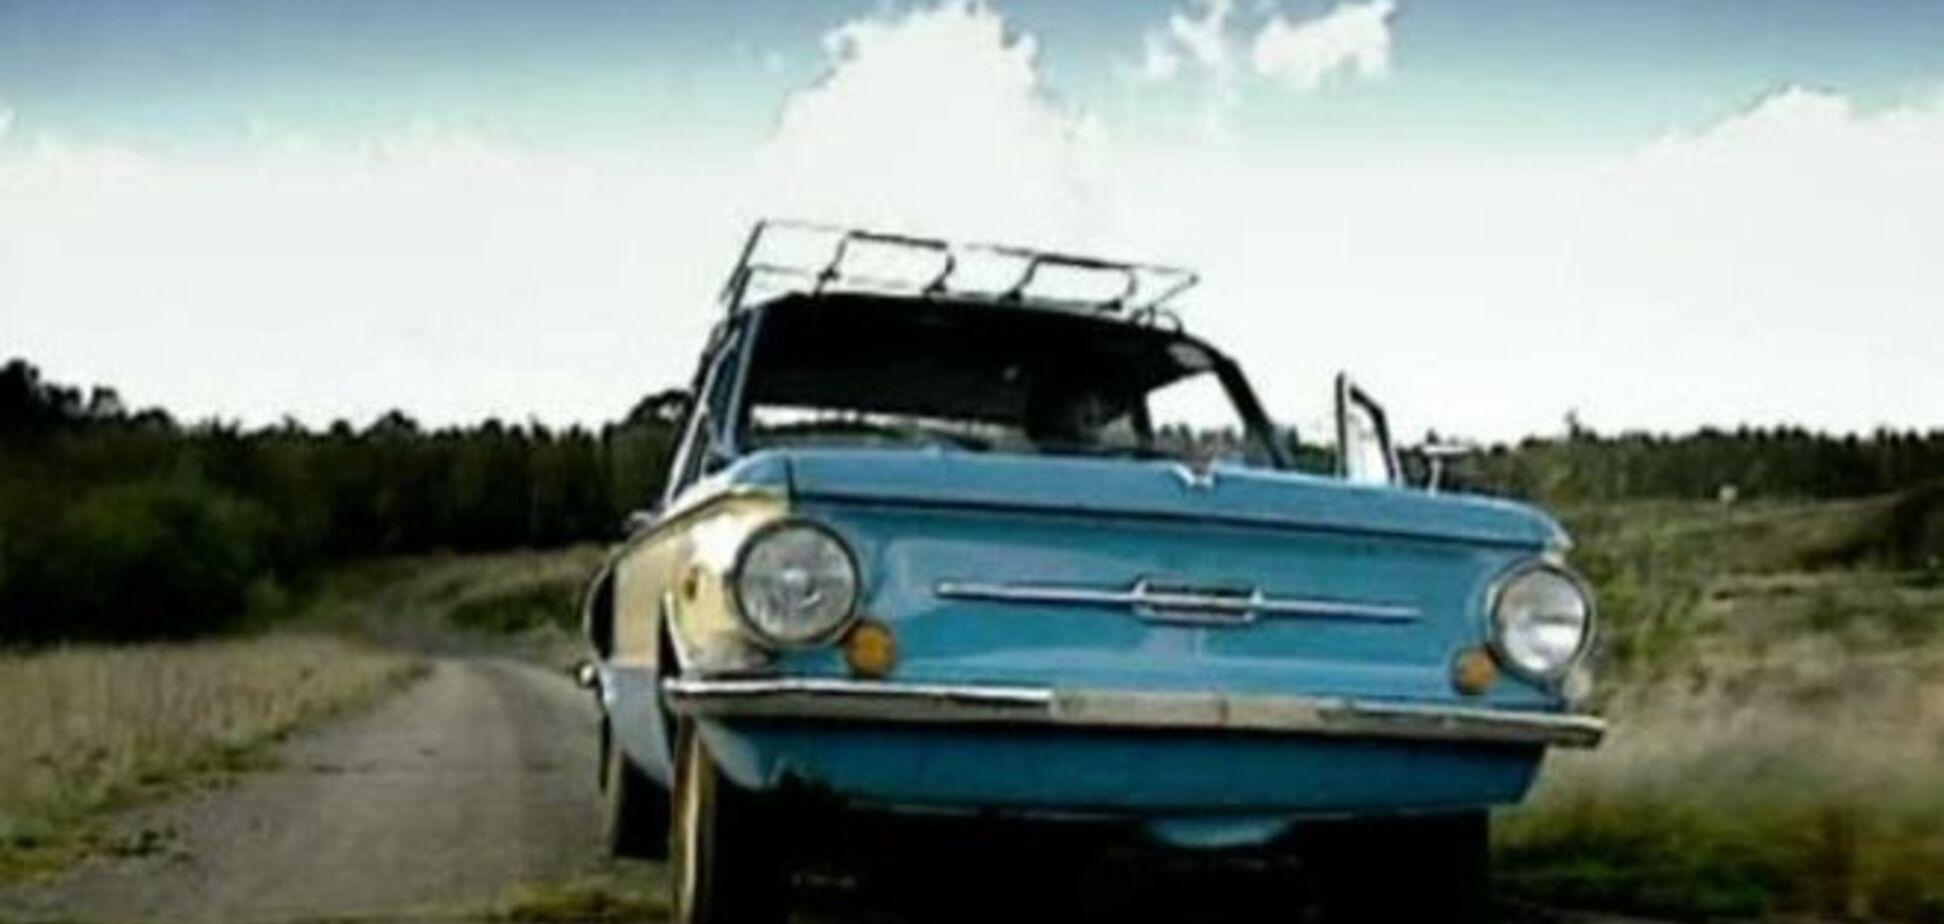 Top Gear жестко потроллил 'Запорожец' и Maybach: видео стеба